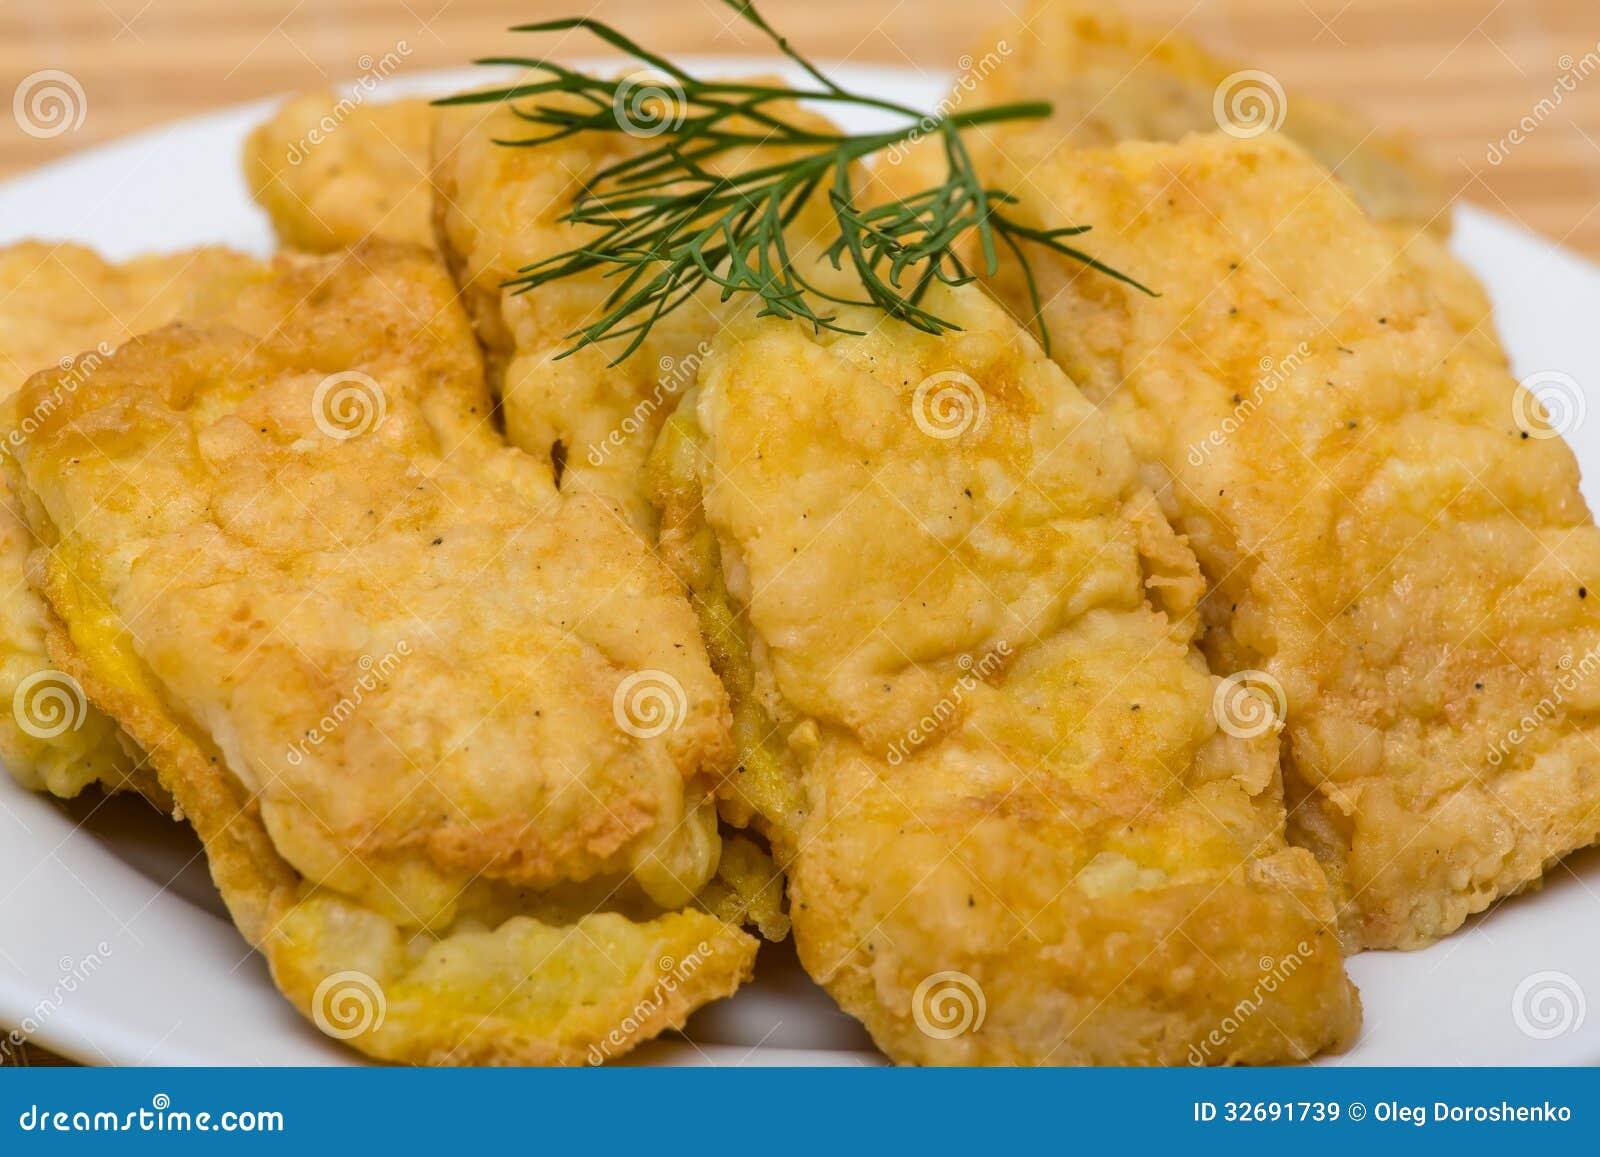 Fried fish fillet royalty free stock images image 32691739 for Fried fish fillet